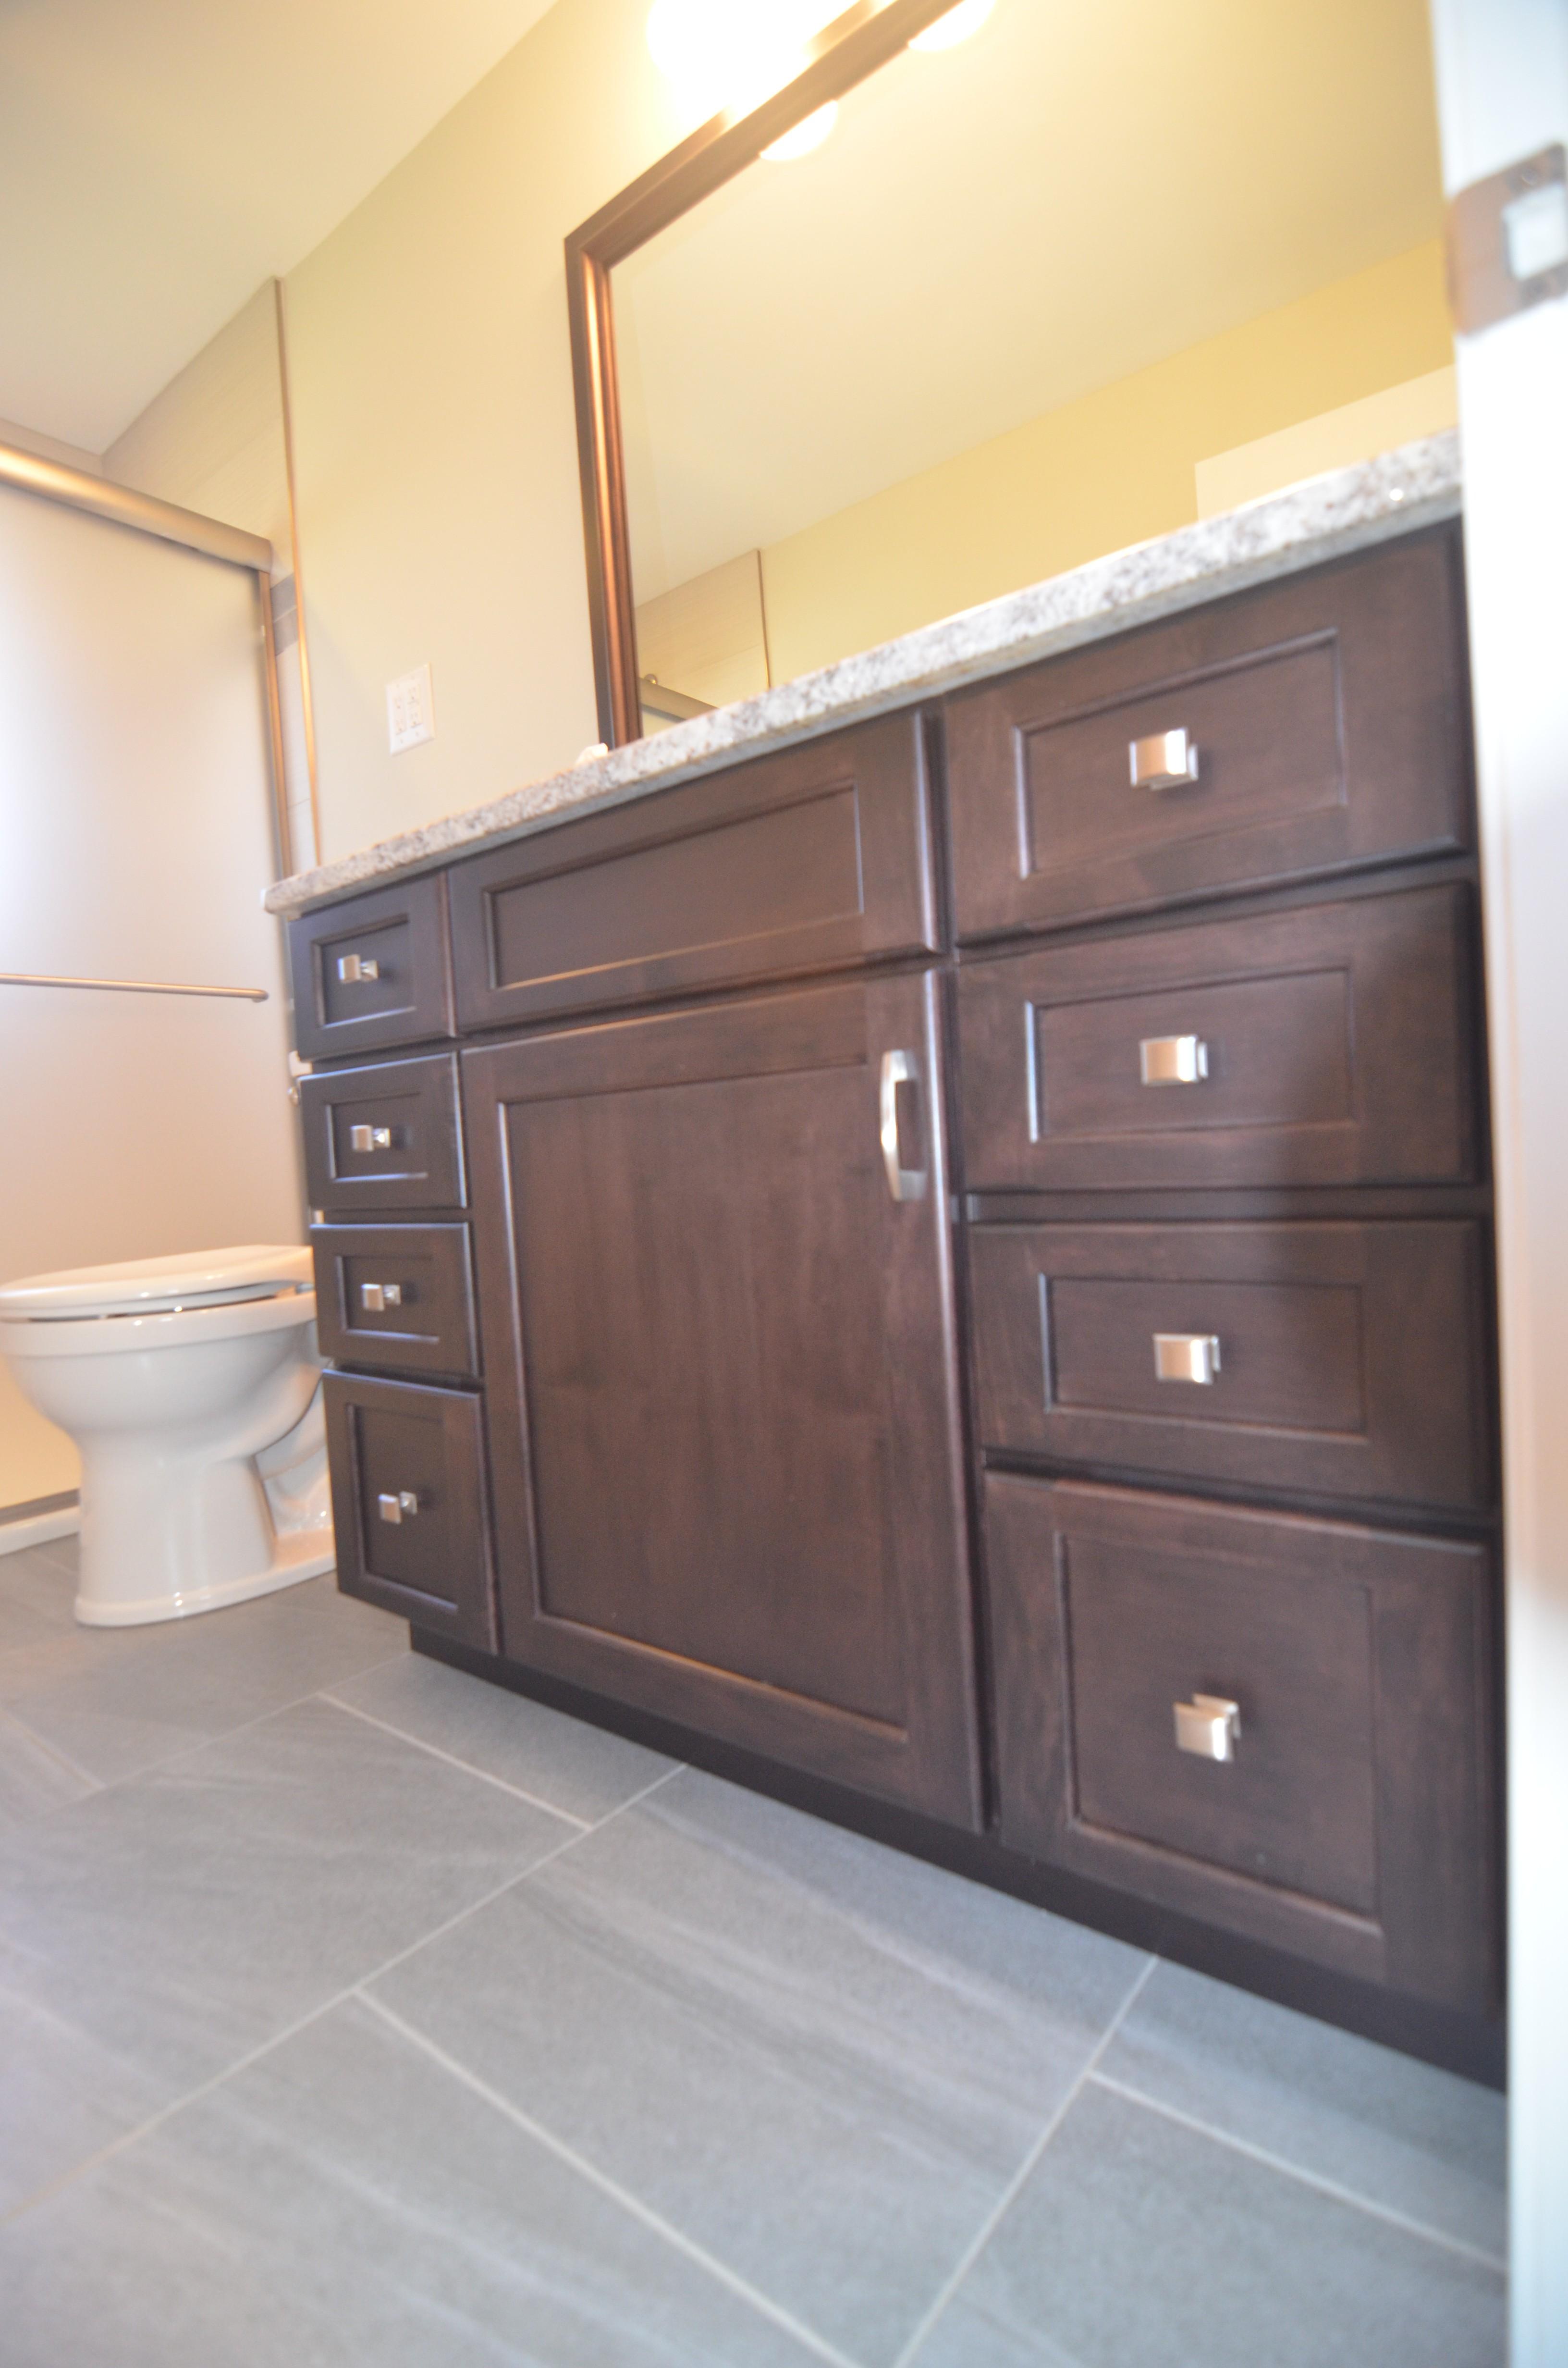 Cherry hill nj bathroom remodel next level remodeling for Nj bathroom remodel